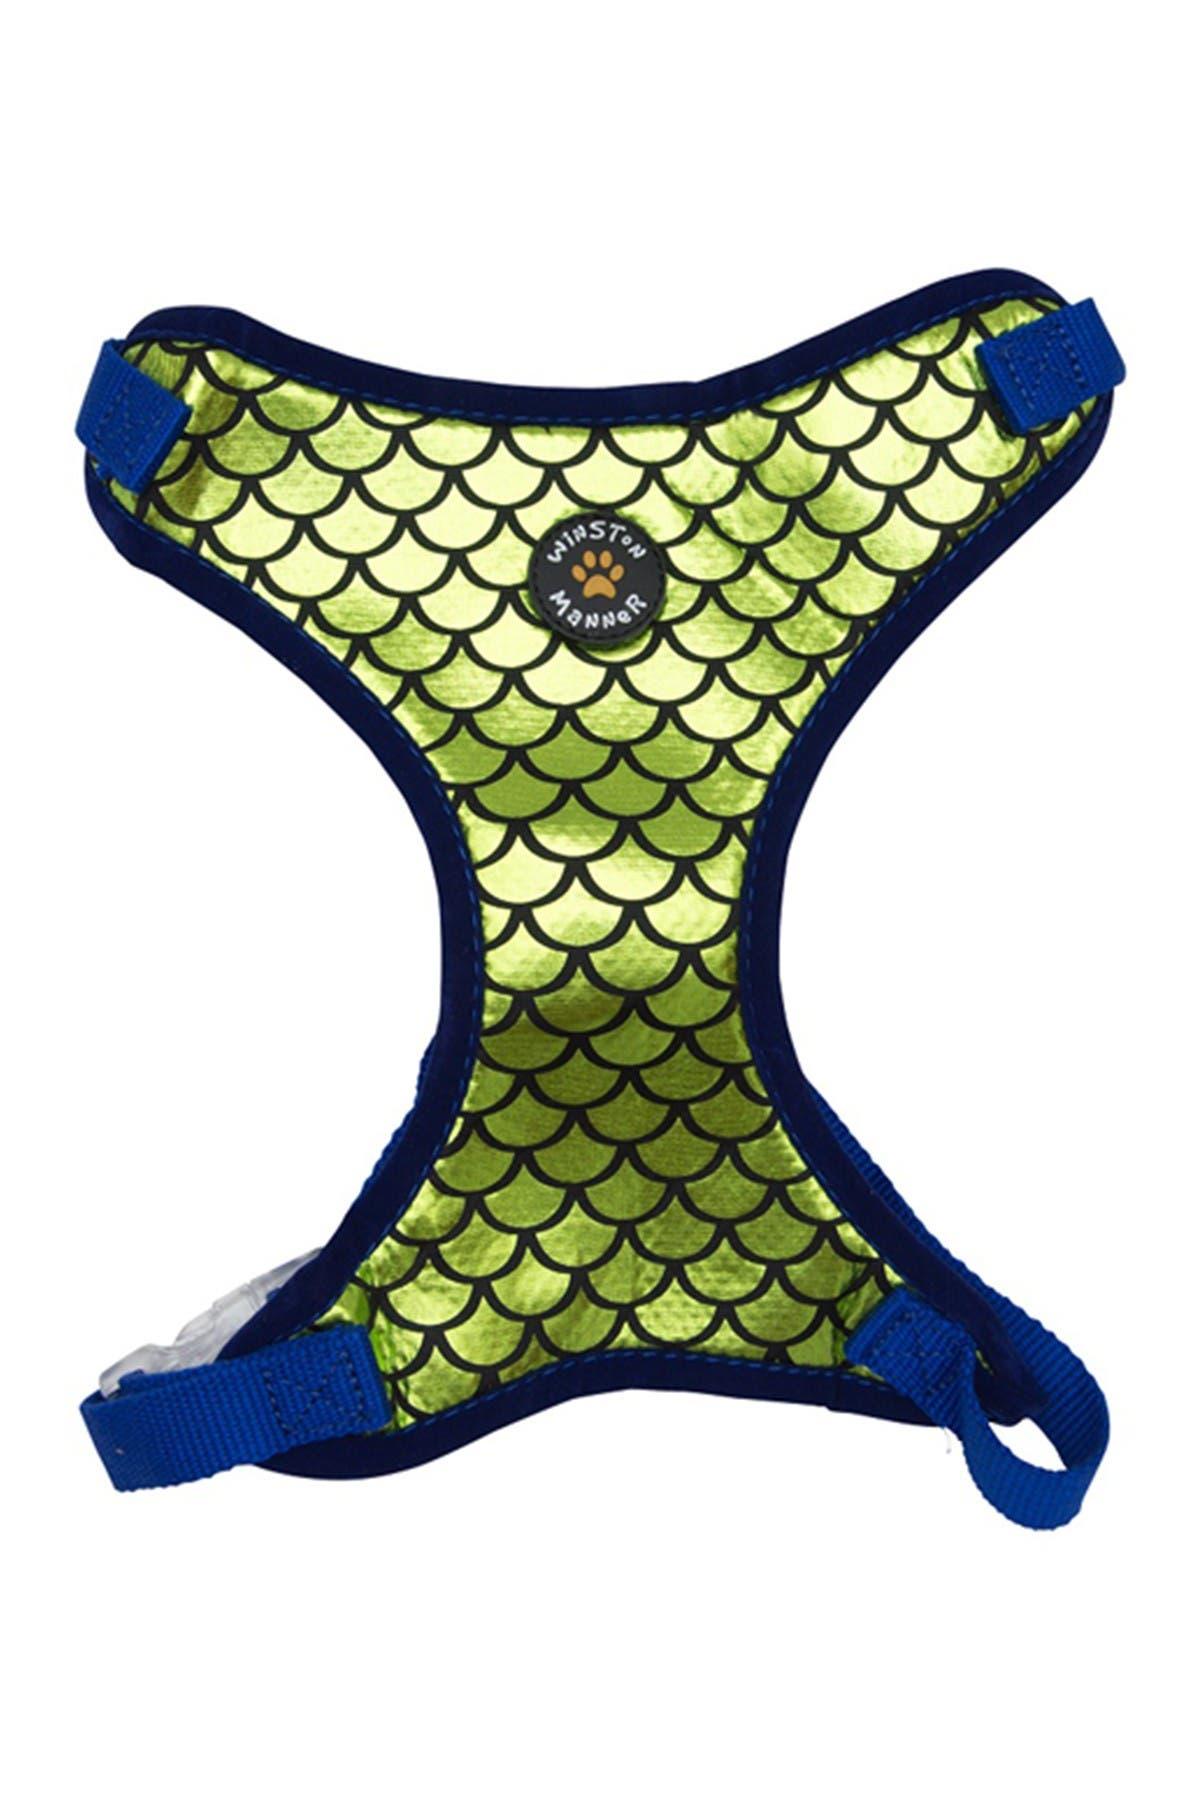 Image of Winston Manner Small Green Atlantis Harness